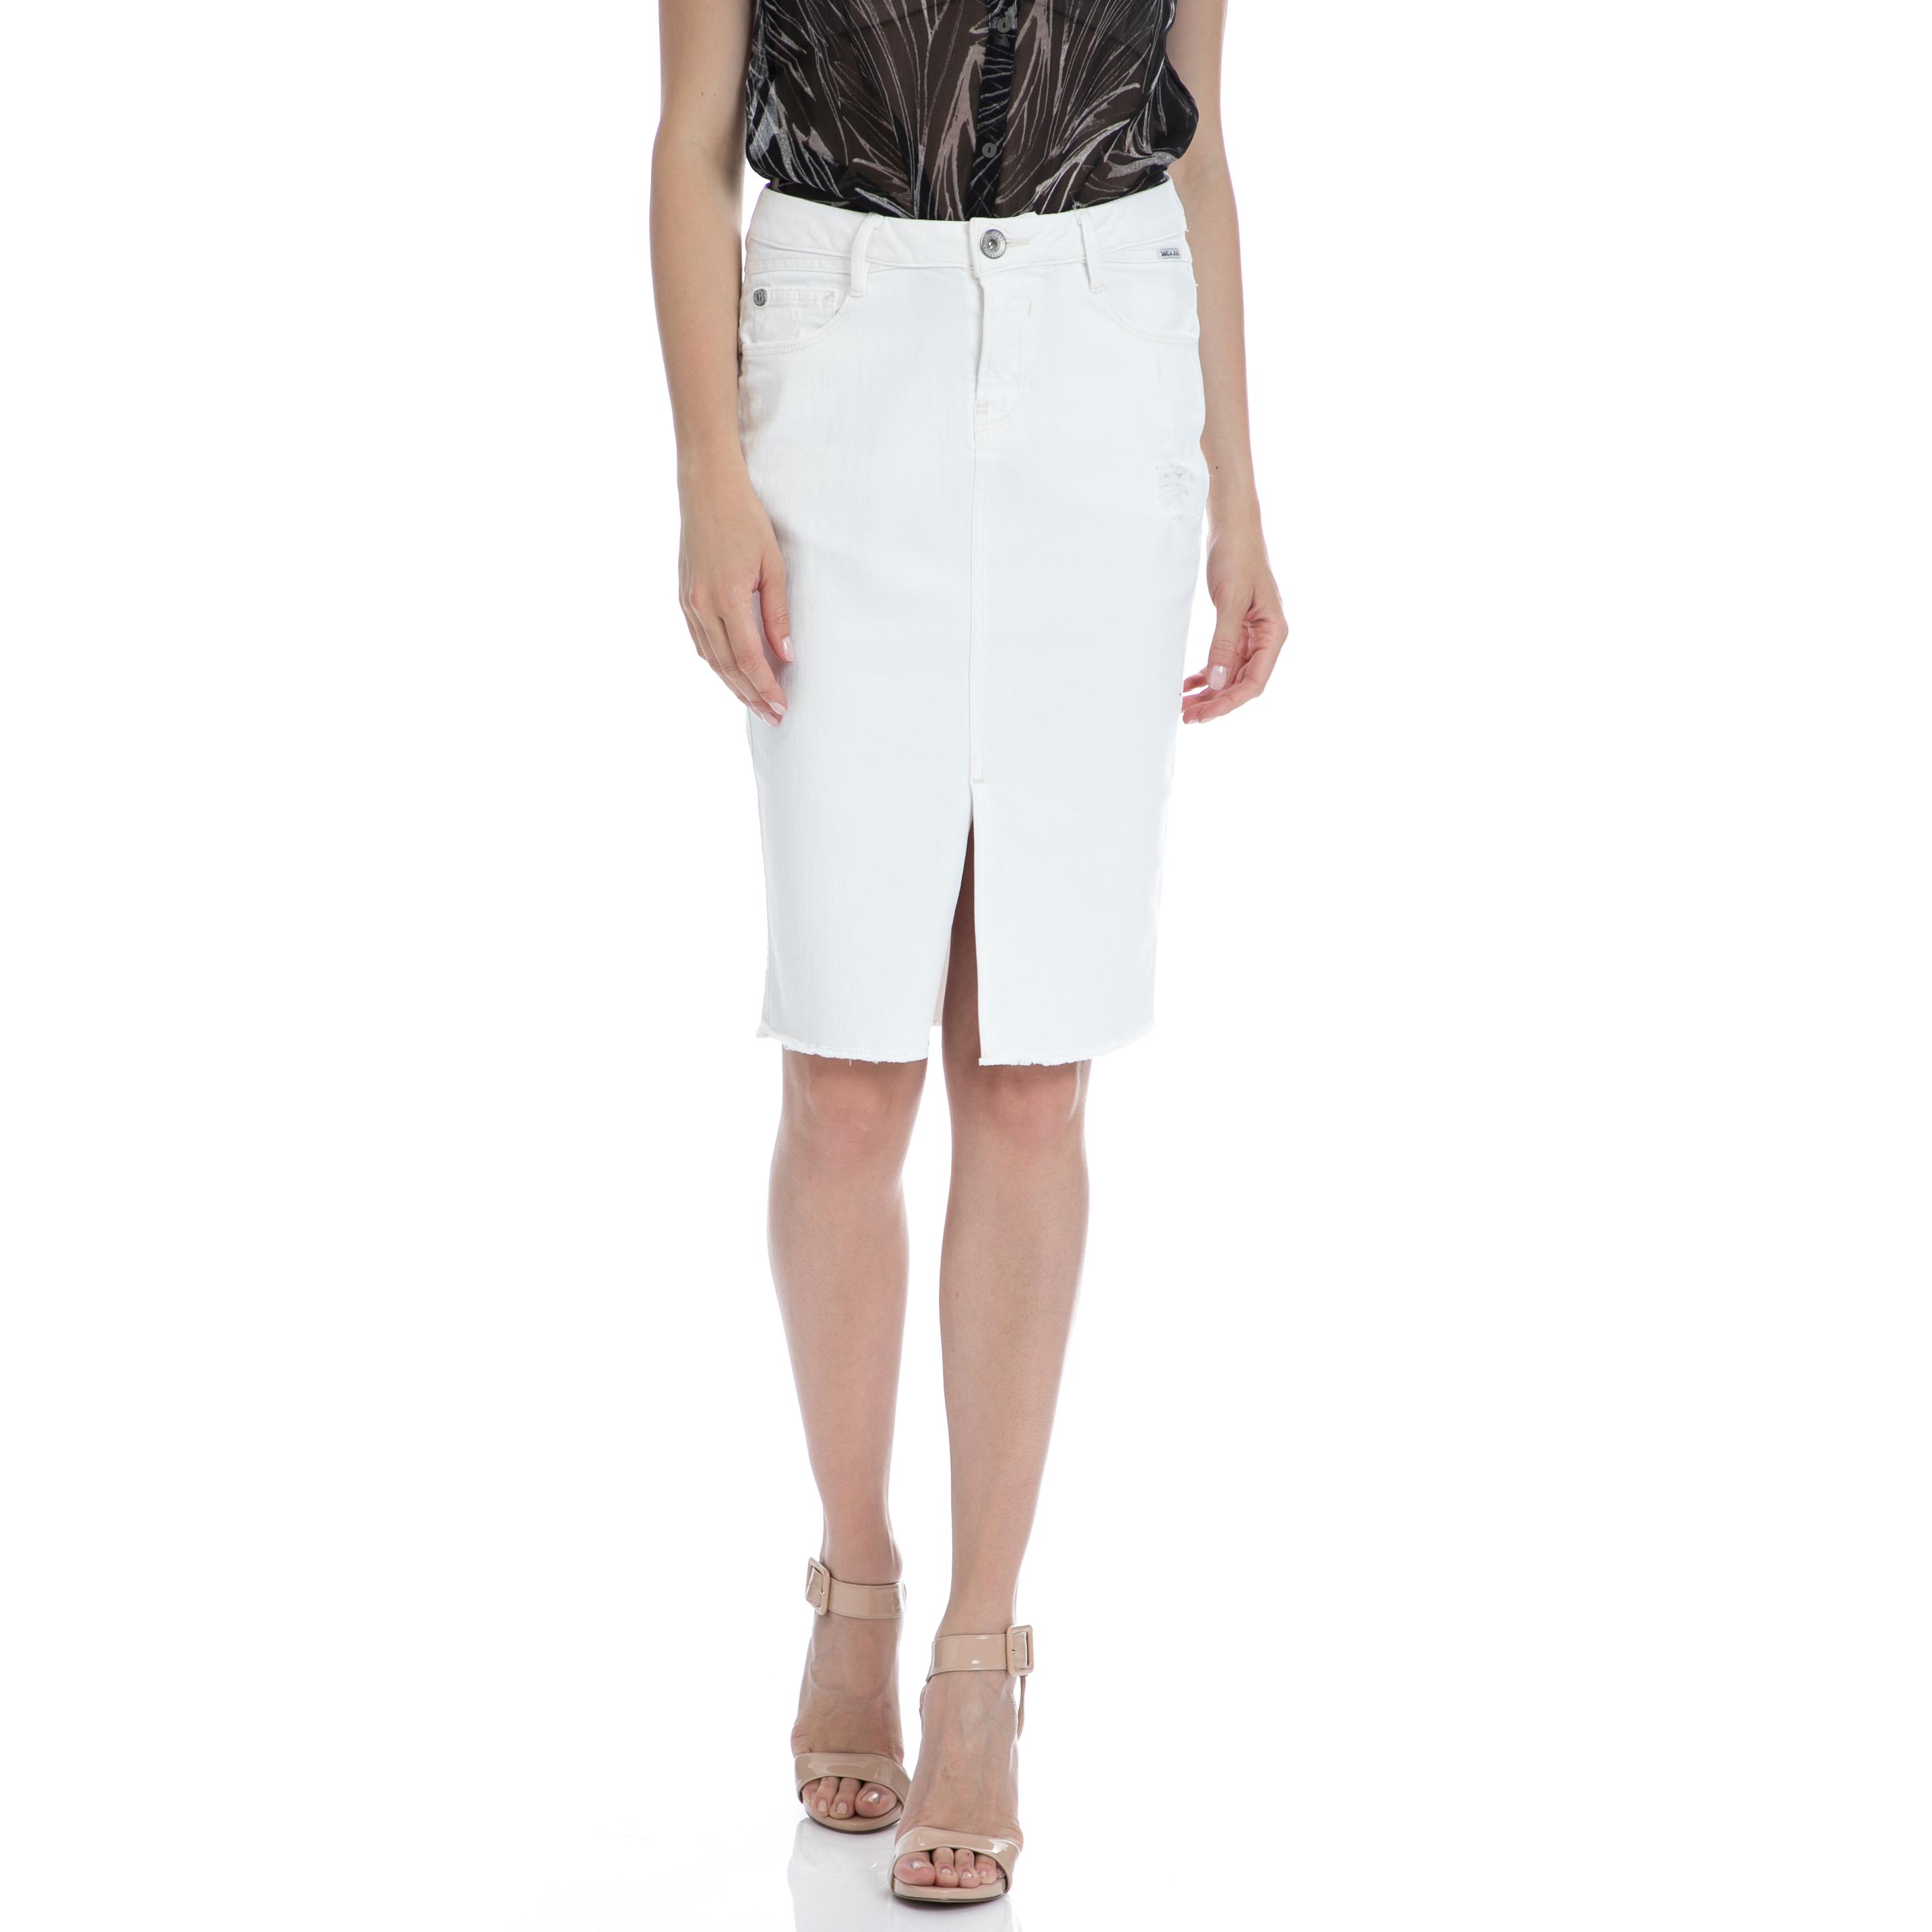 GARCIA JEANS - Γυναικεία φούστα Garcia Jeans λευκή γυναικεία ρούχα φούστες μέχρι το γόνατο